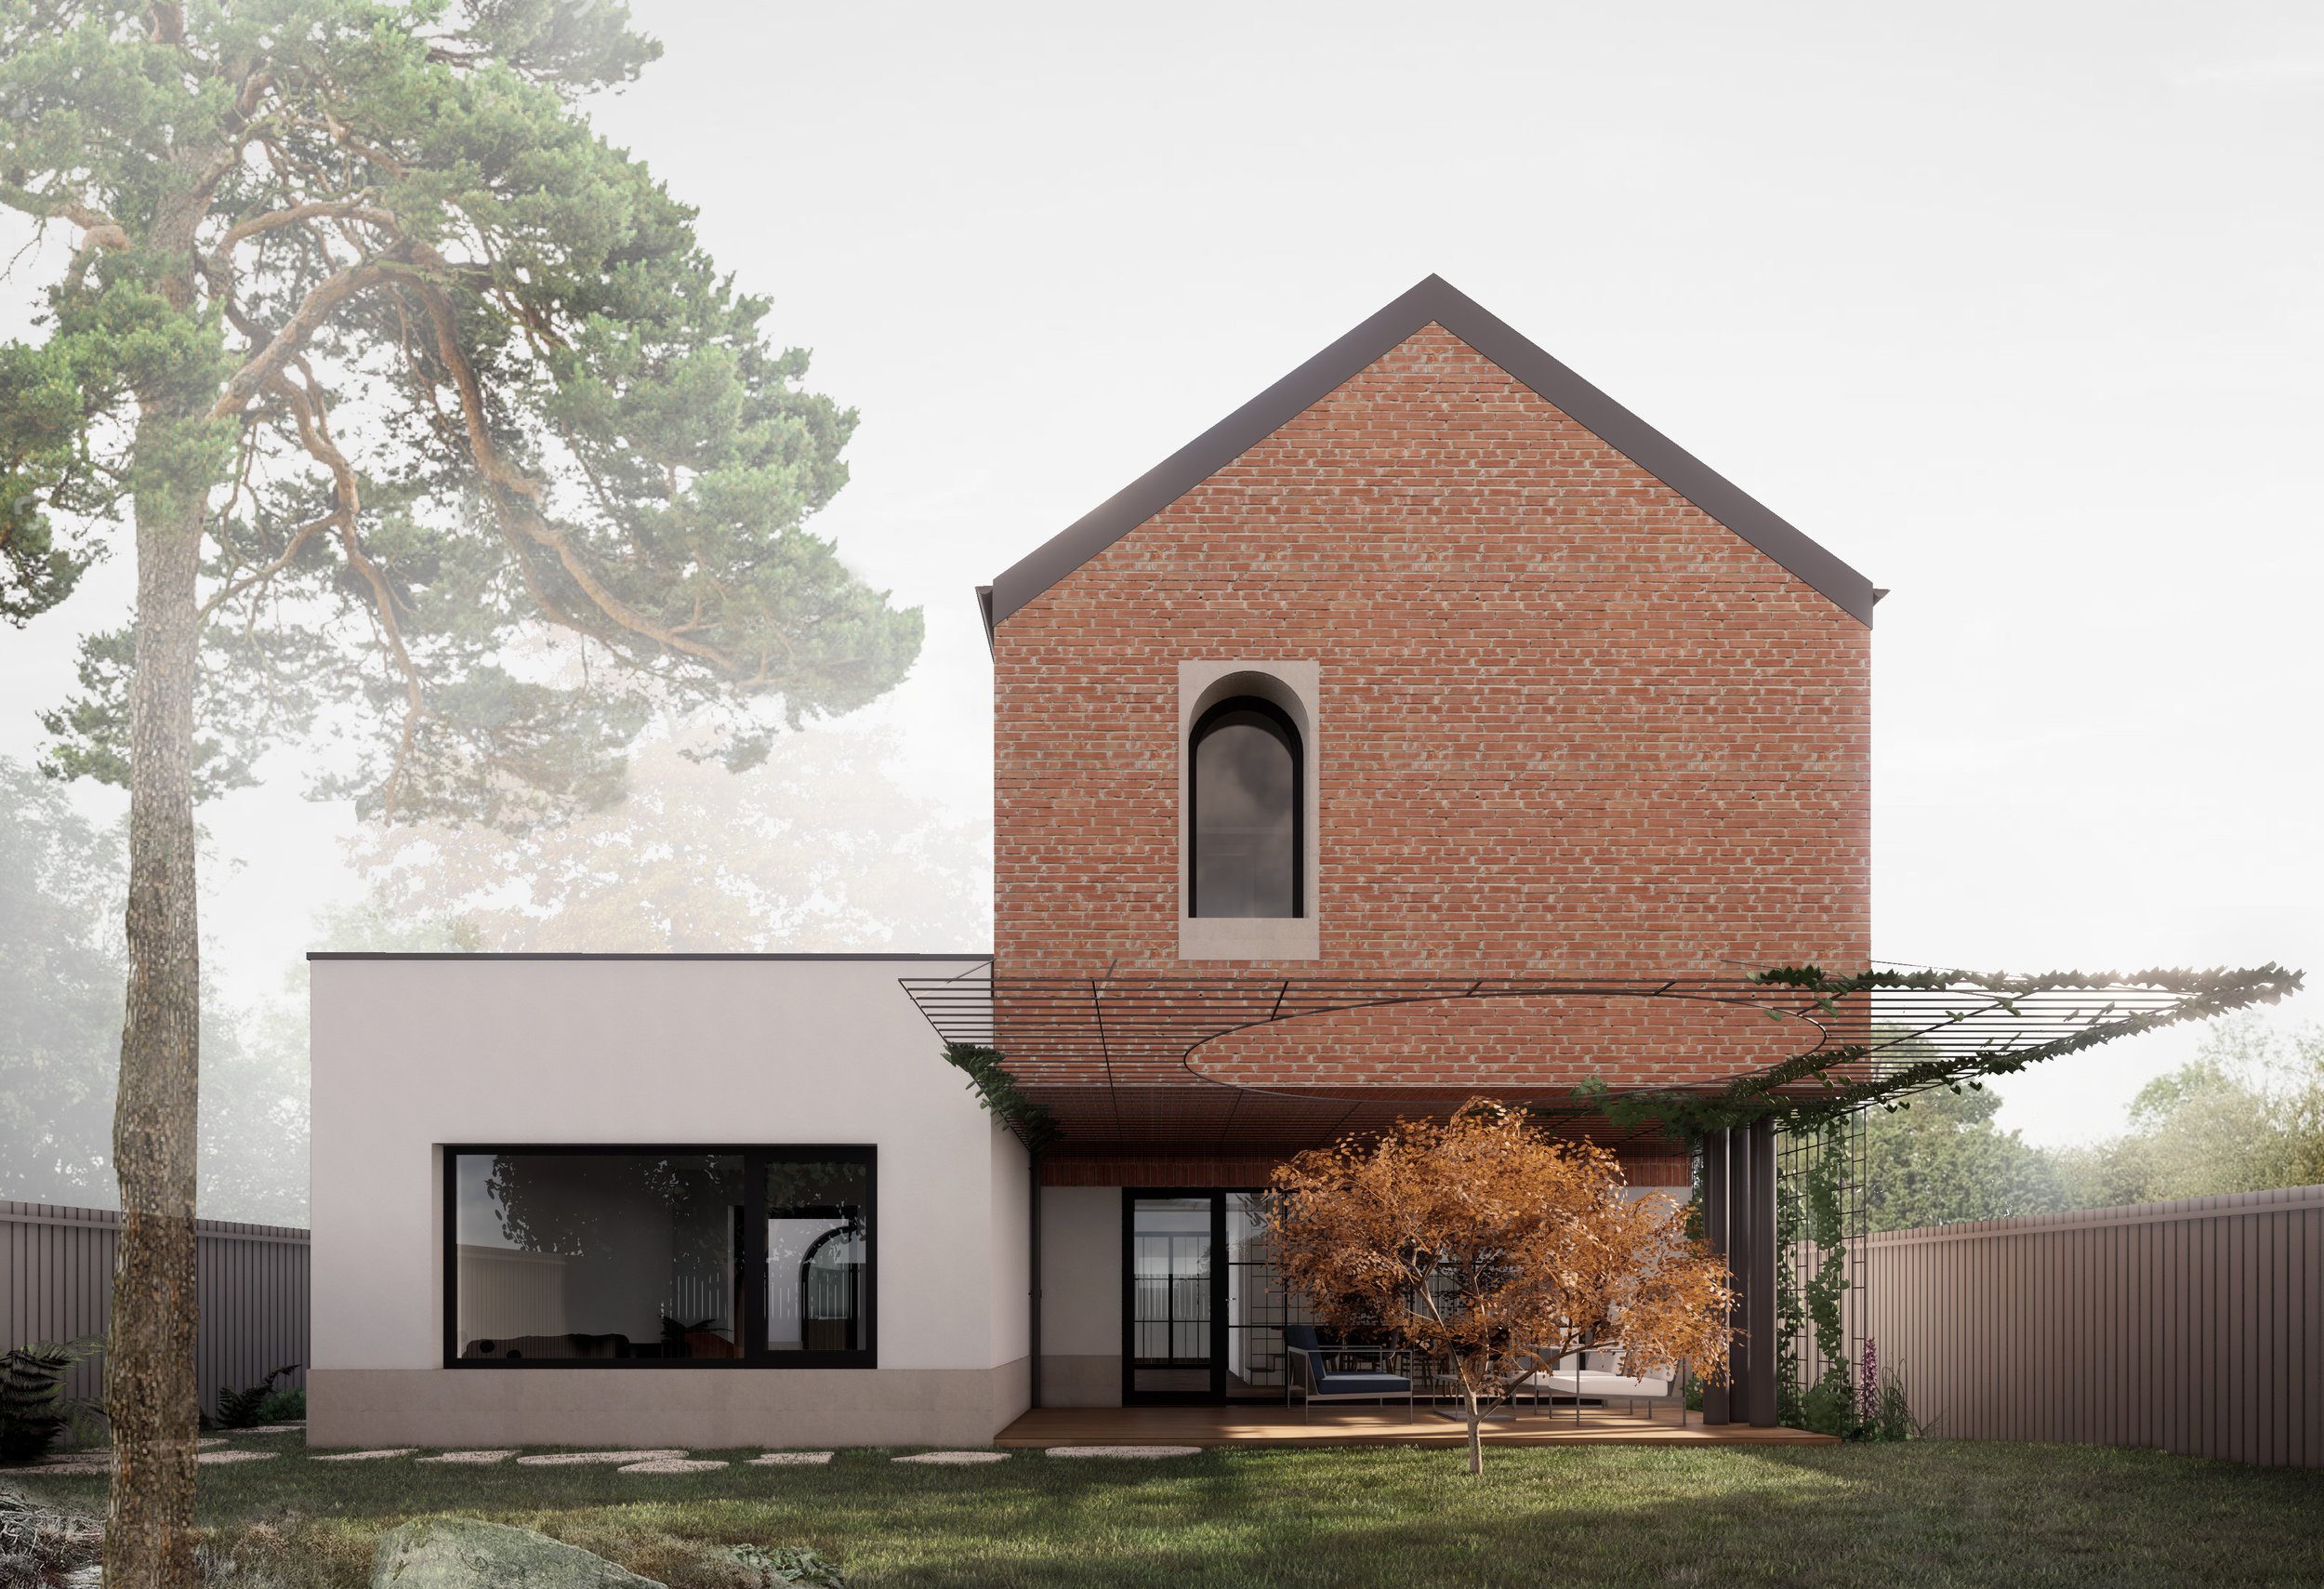 proiectare locuinta Studio A19 arhitect